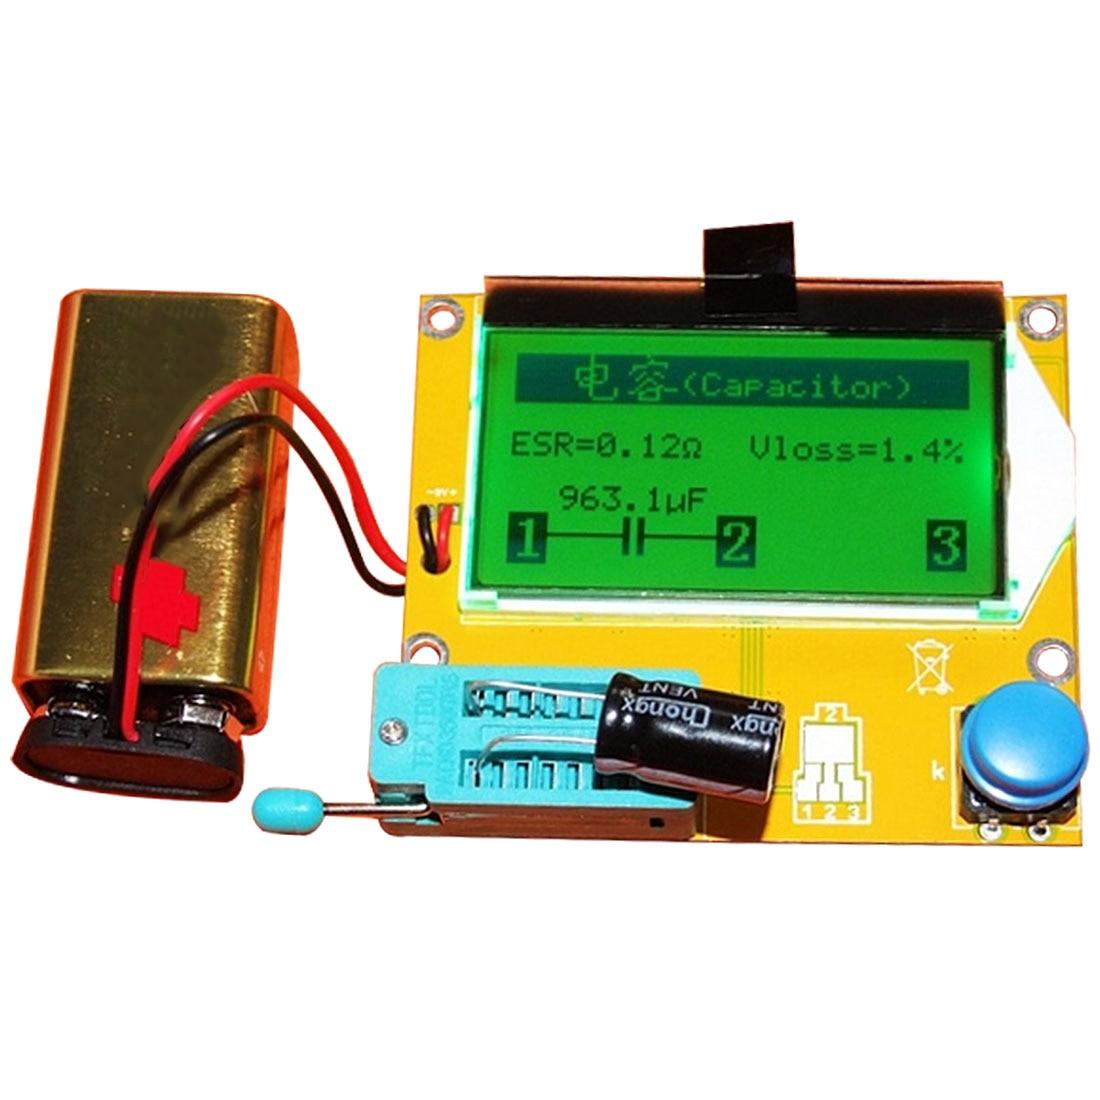 Digitale LCR M328 V2.68 ESR-T4 Diode Triode Kapazität MOS/PNP/NPN LCR 12864 LCD Screen Tester für ESR meter Transistor Test